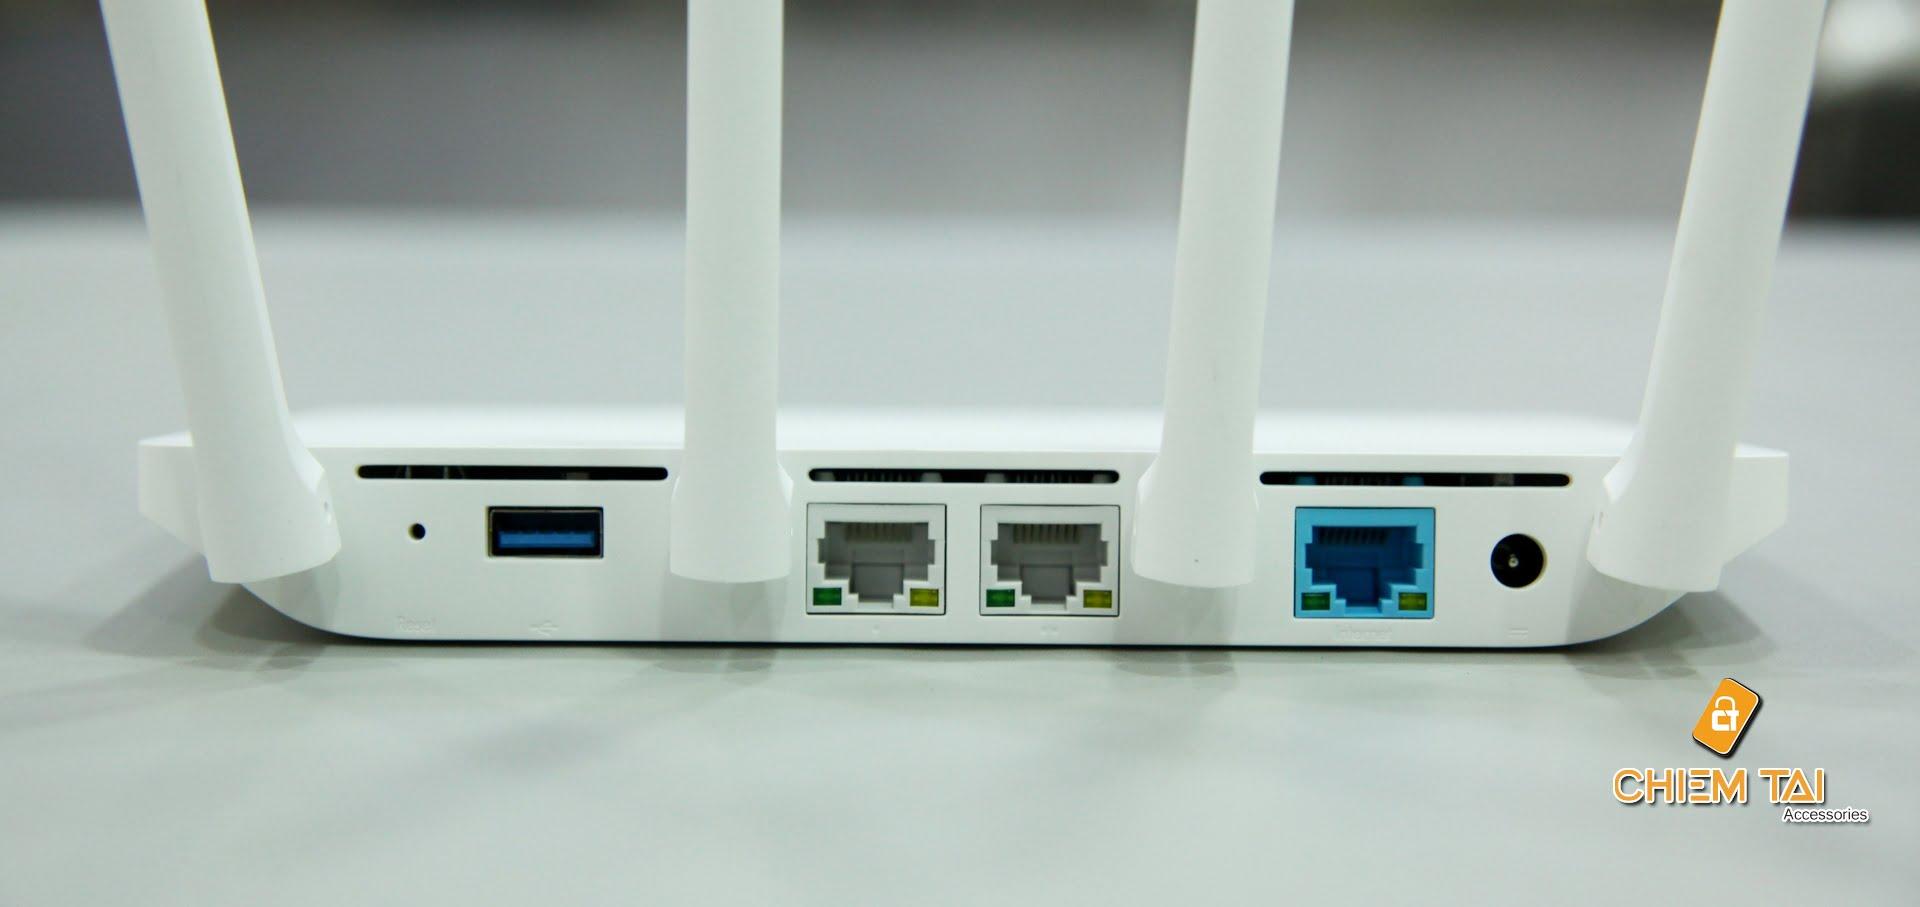 bo phat wifi xiaomi router gen 3g ac1200 6007fdc562b8a